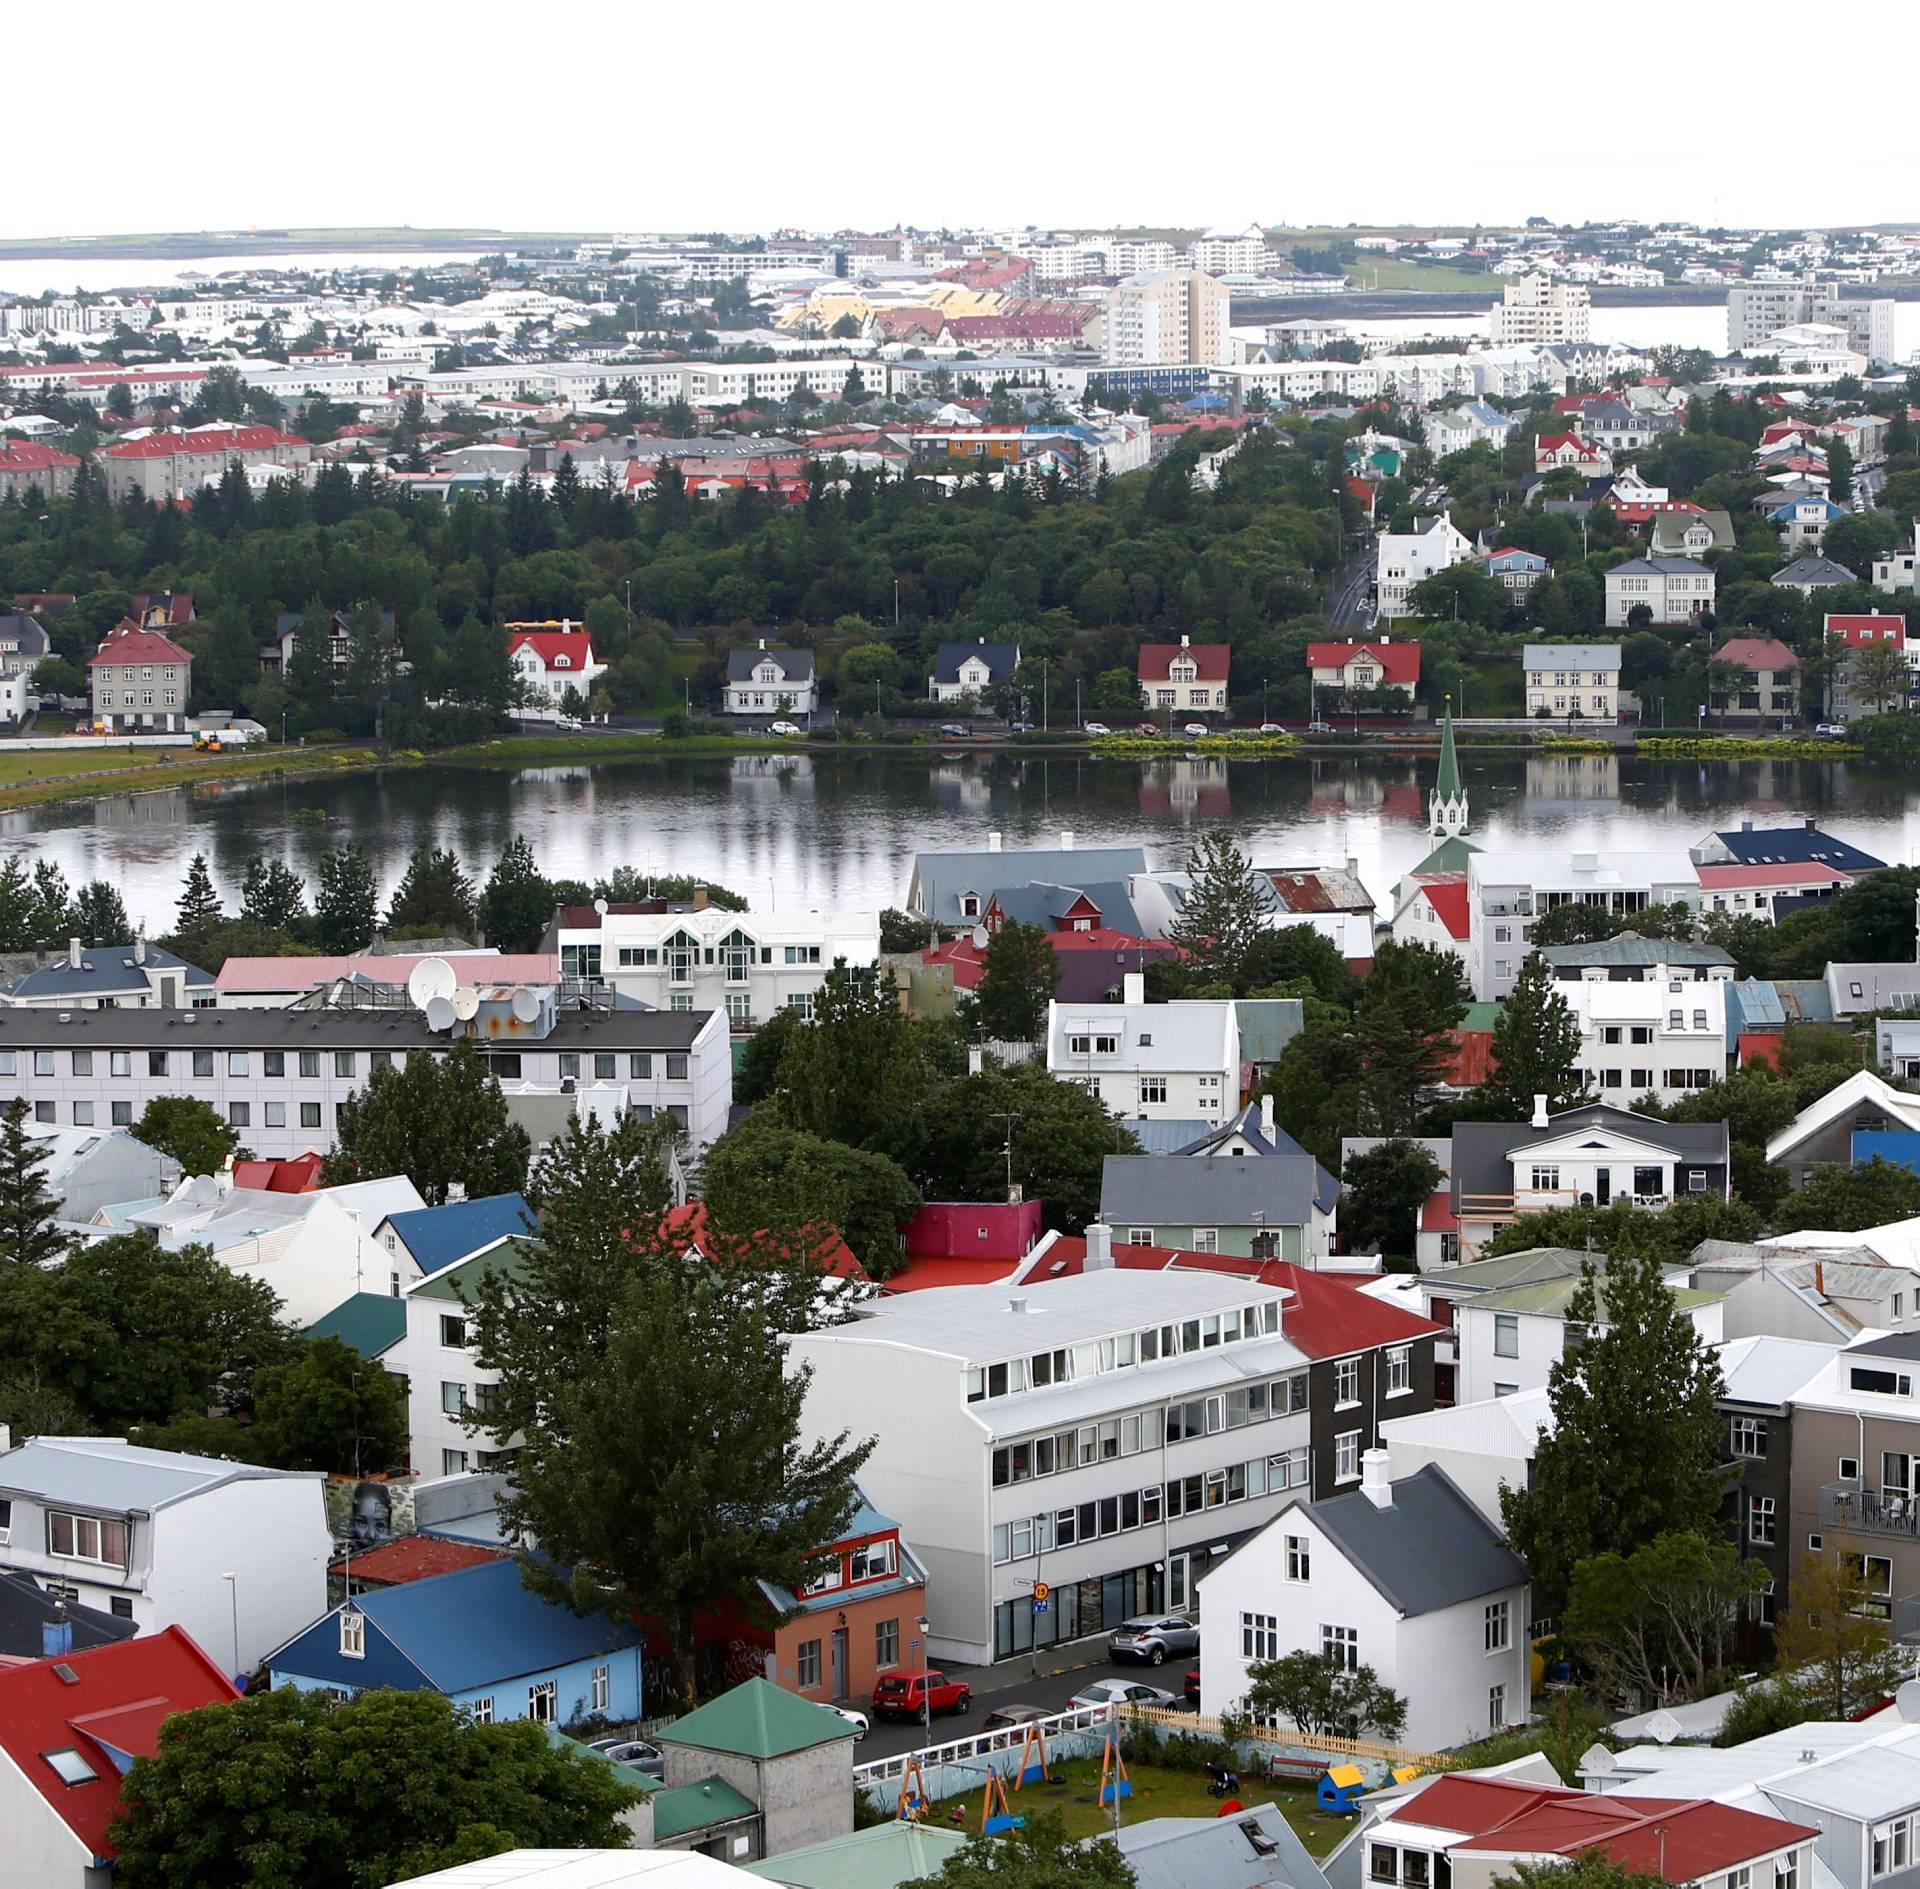 General view shows city of Reykjavik, seen from Hallgrimskirkja church